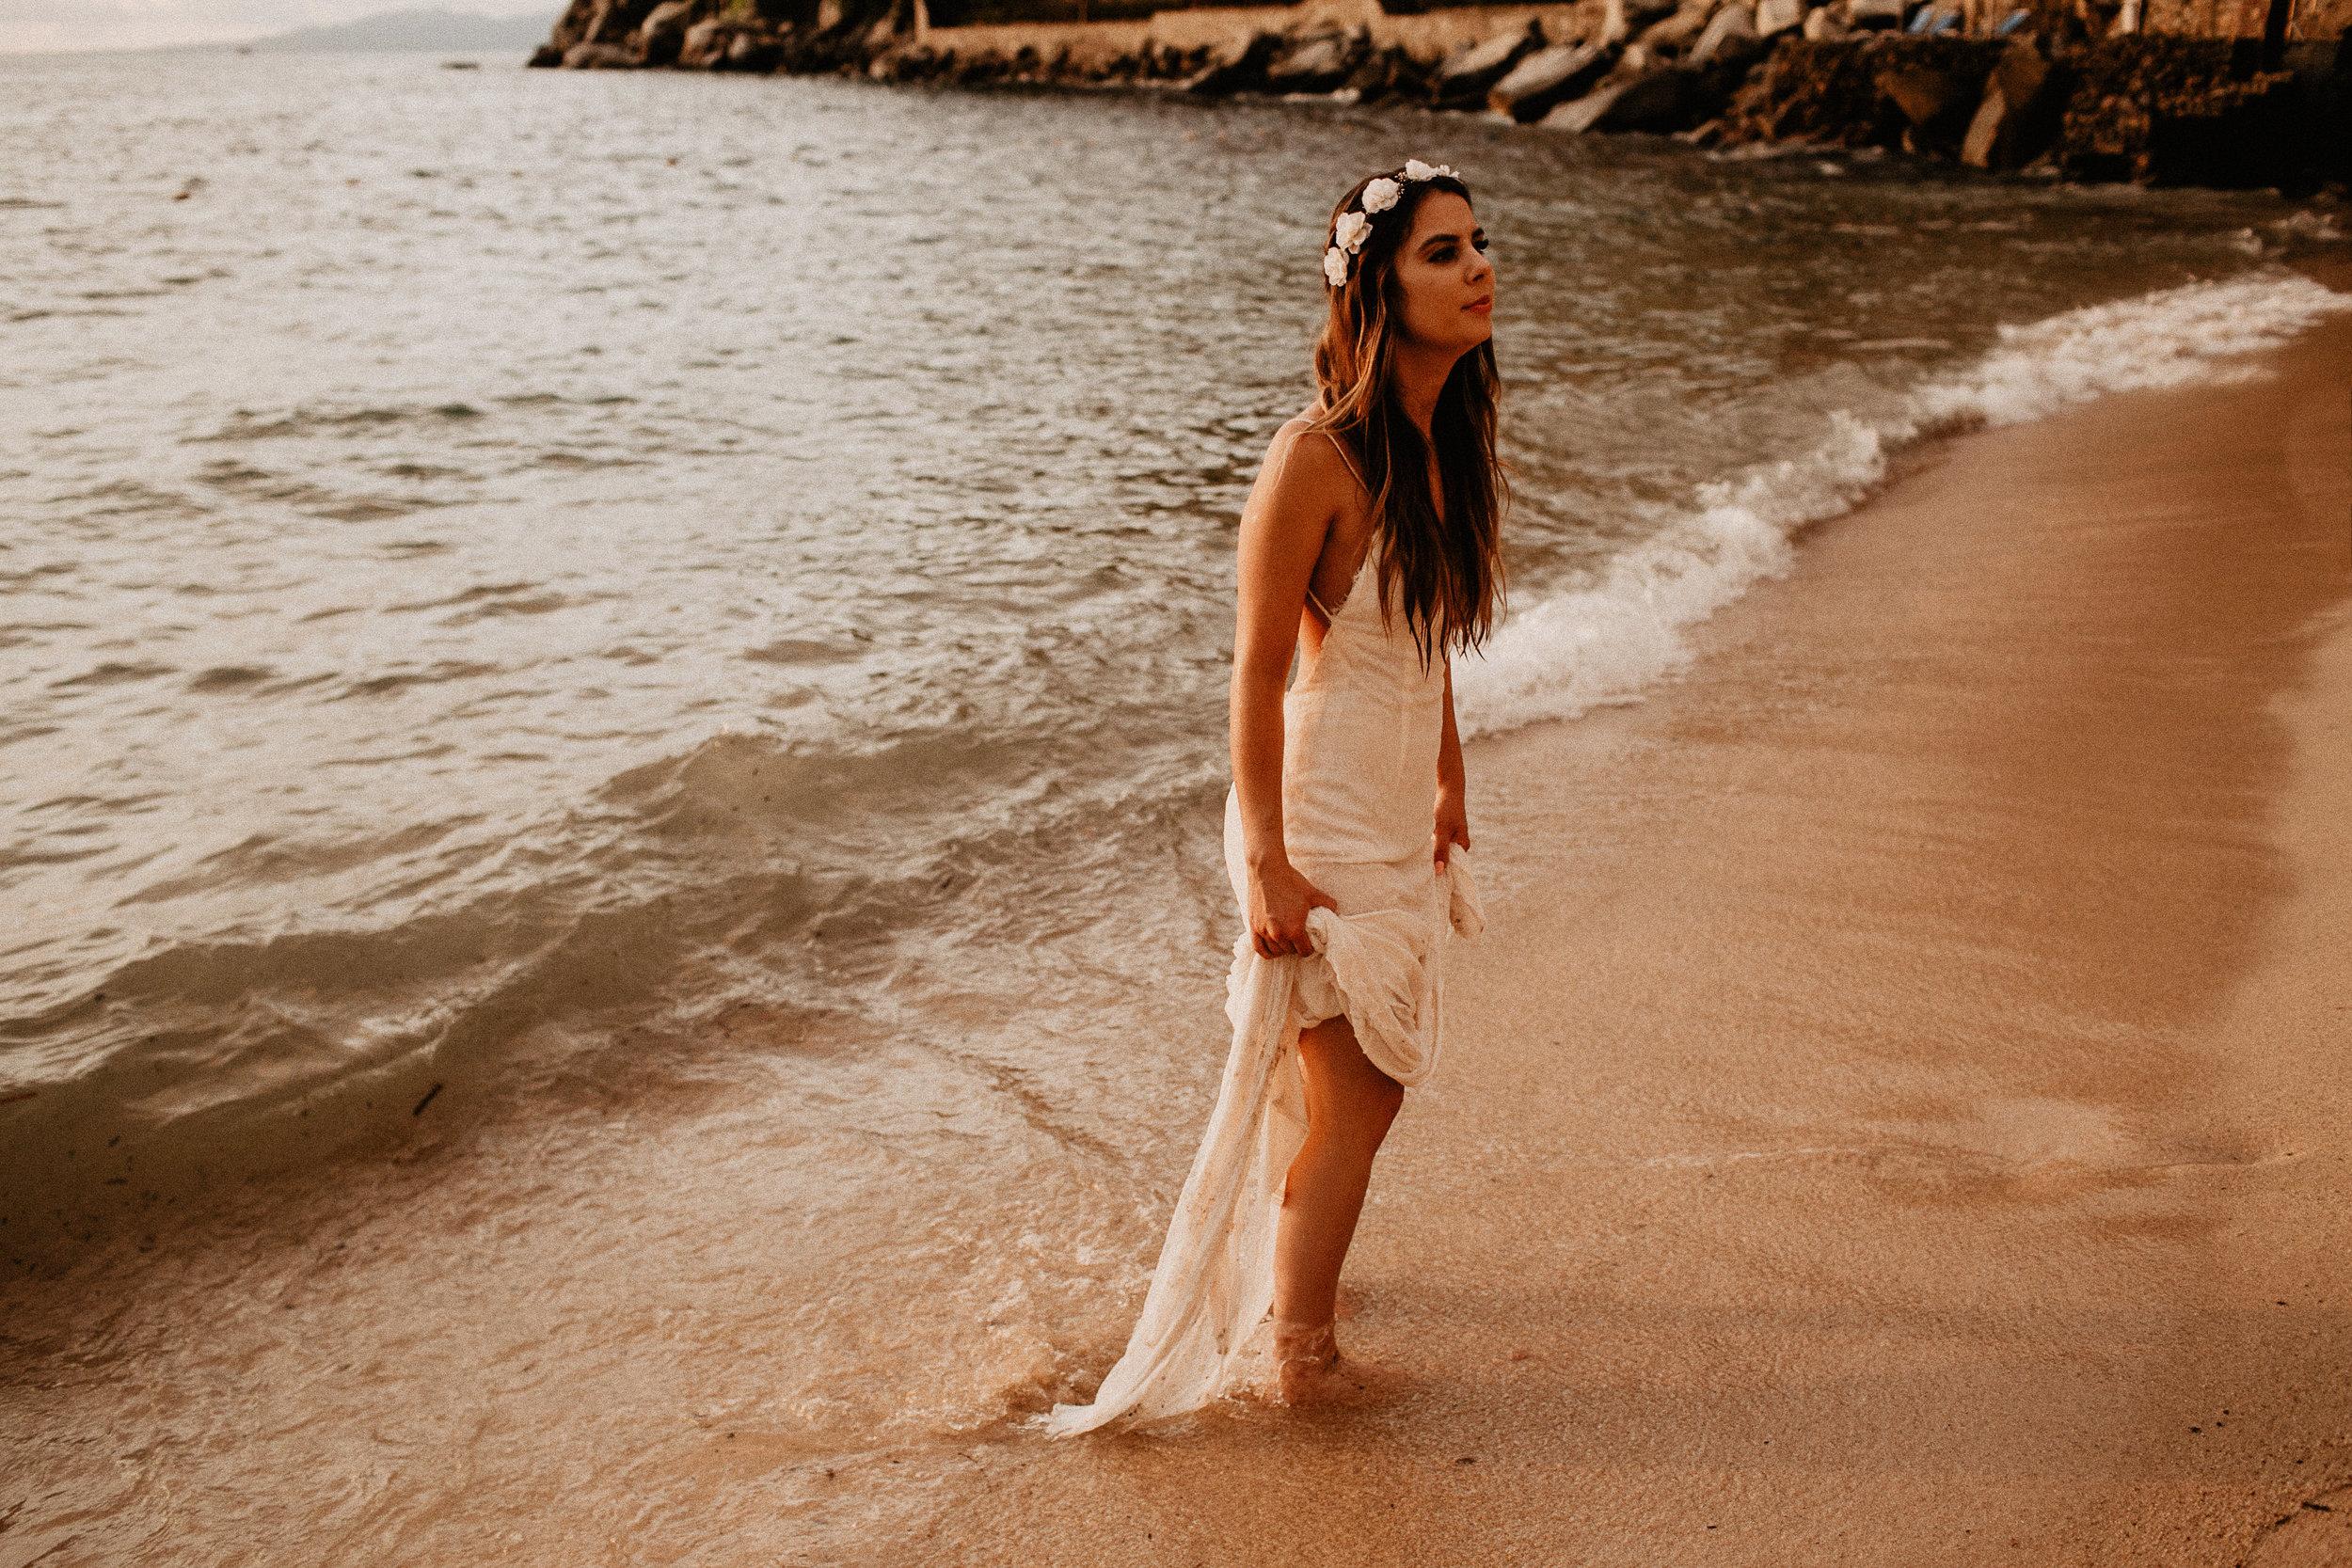 alfonso_flores_destination_wedding_photography_puerto_vallarta_hotel_barcelo_vallarta_cuttler_amela-816.JPG